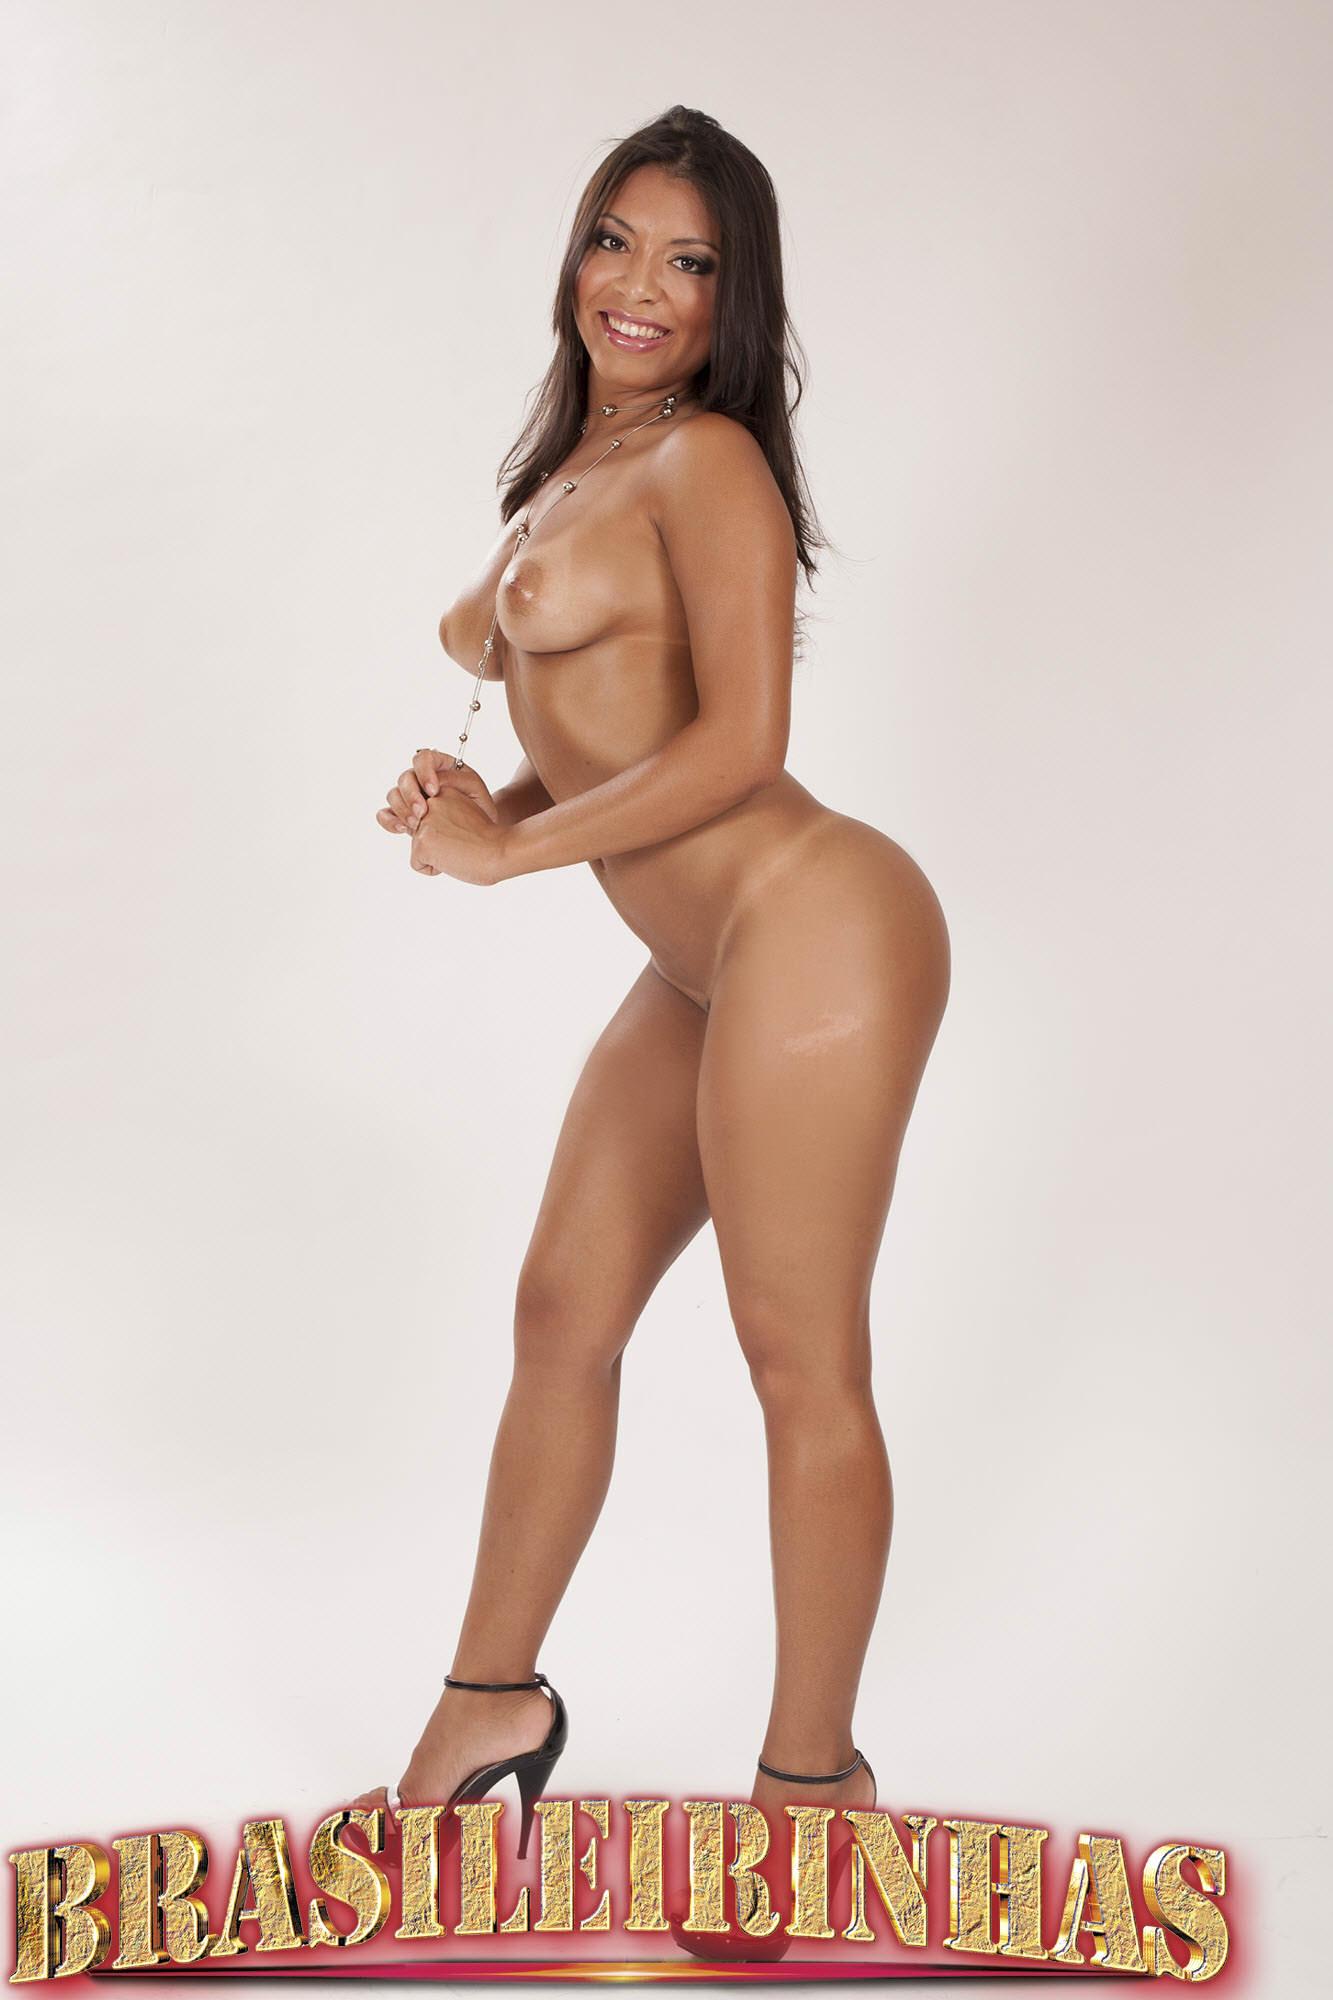 Amanda Gostosa Nua morena de bunda perfeita amanda benites fazendo muito sexo